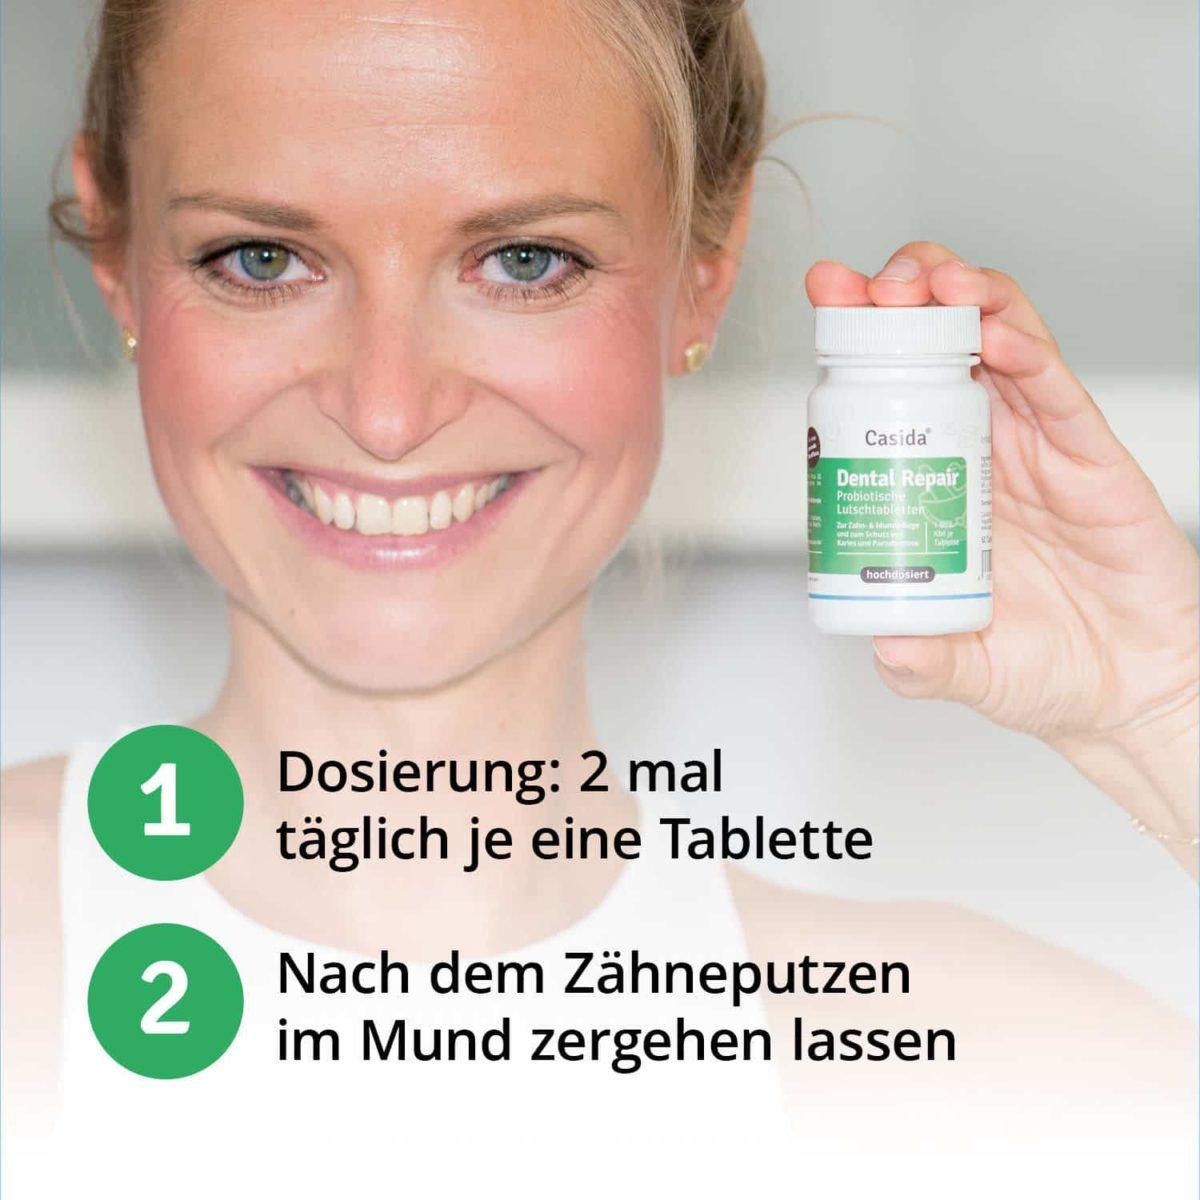 Casida Probiotika Duo Set Dental Repair Lutschtabletten PZN Apotheke DE 14401553 Zahnpflege (6)